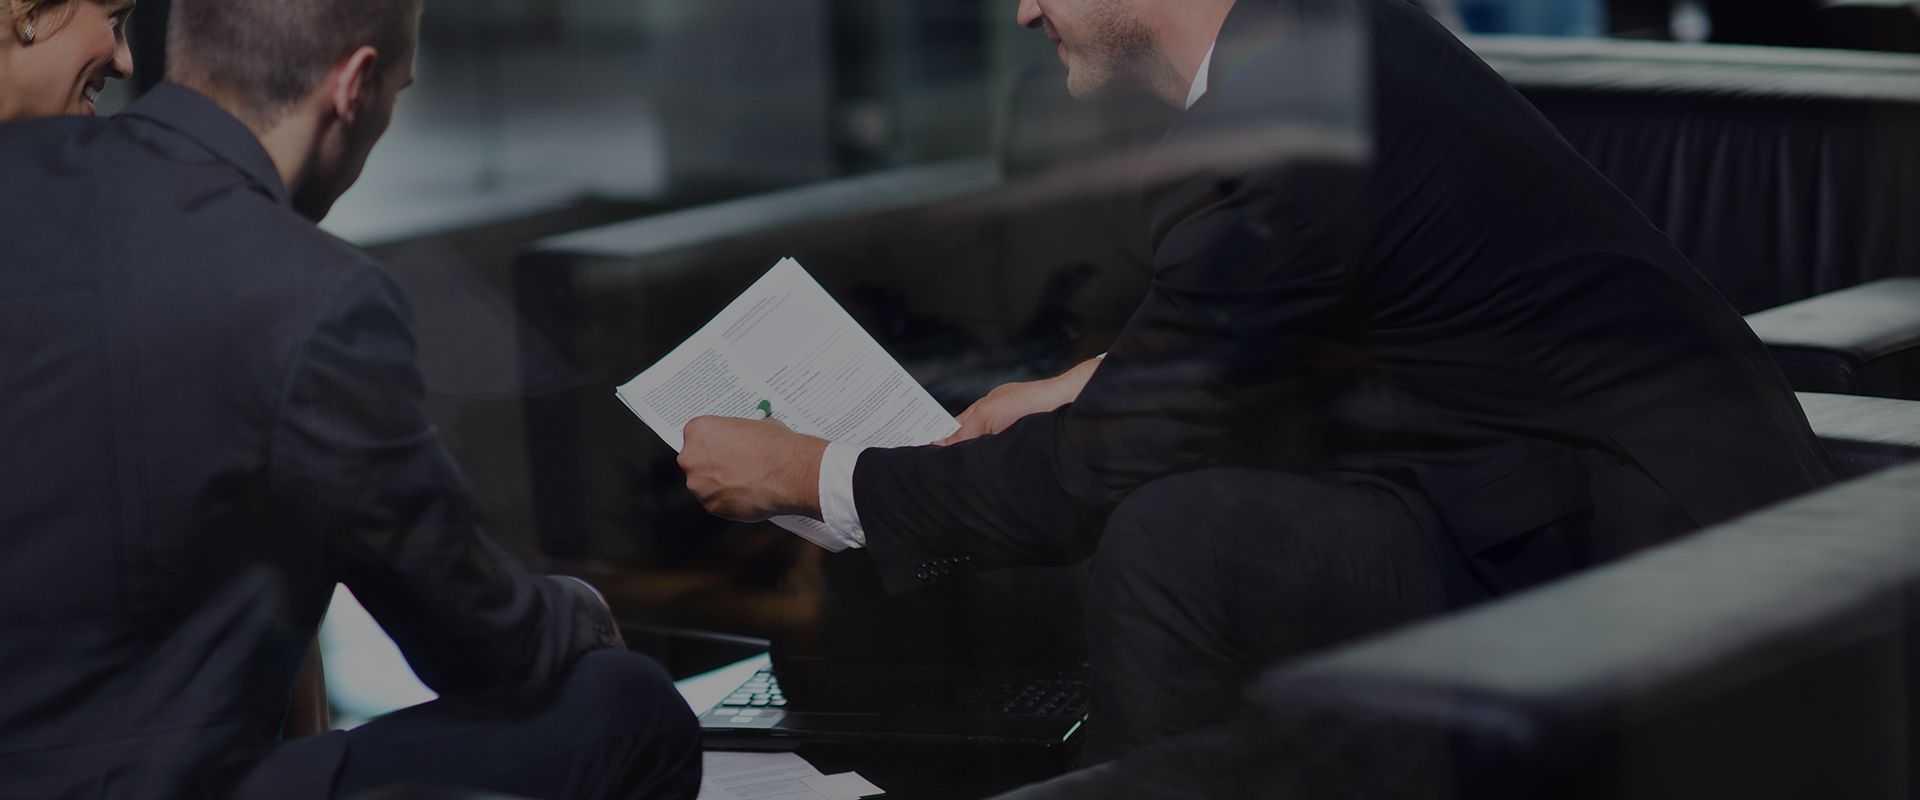 Peregrine Cloud Document Management Solutions